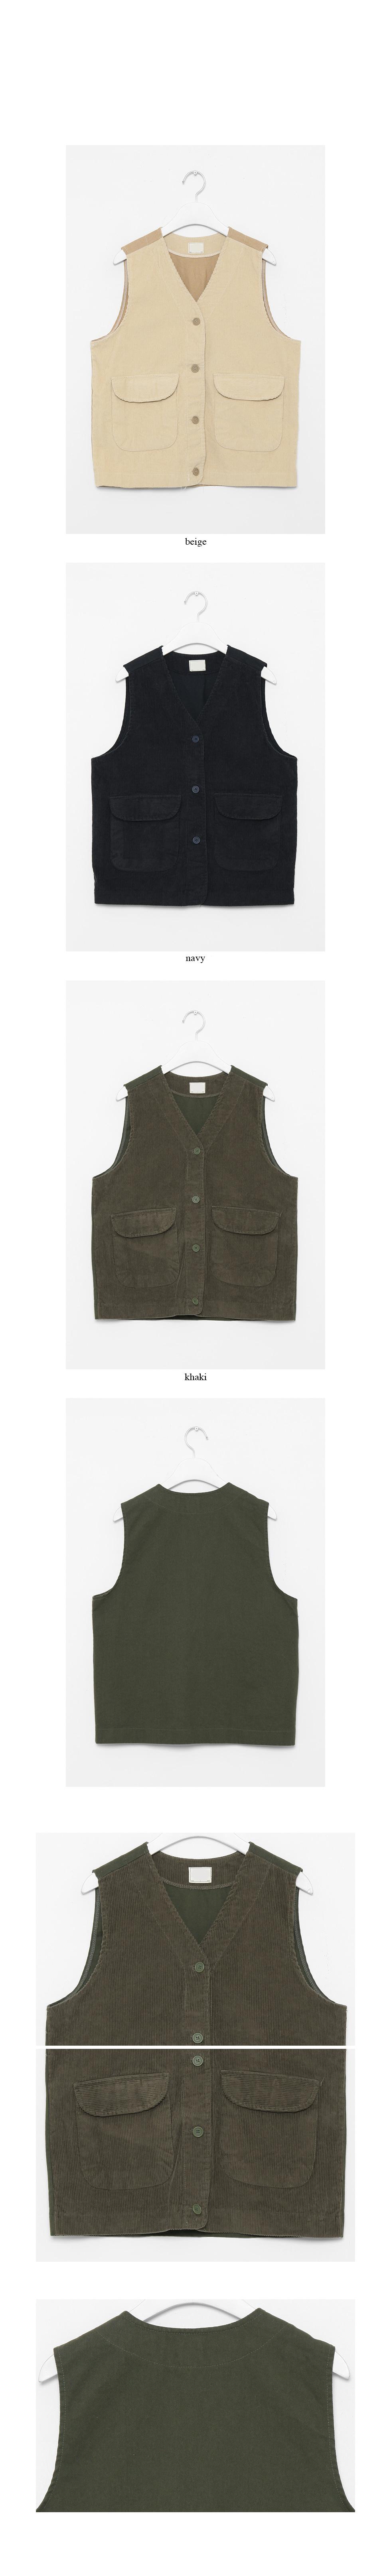 corduroy boy vest